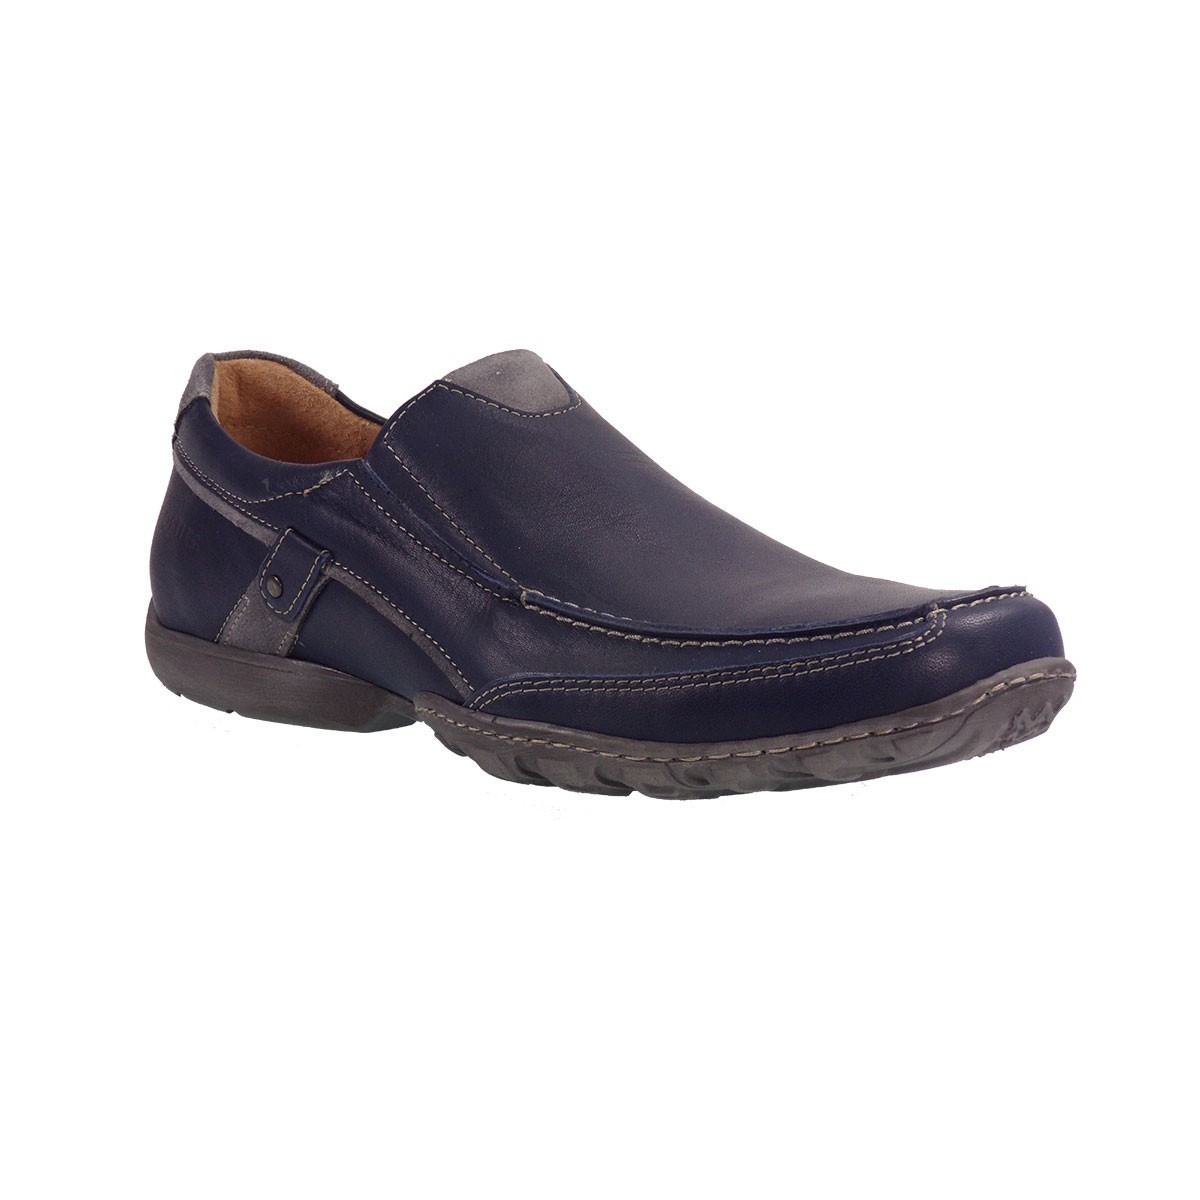 Softies Ανδρικά Παπούτσια 6862 Mπλέ Δέρμα